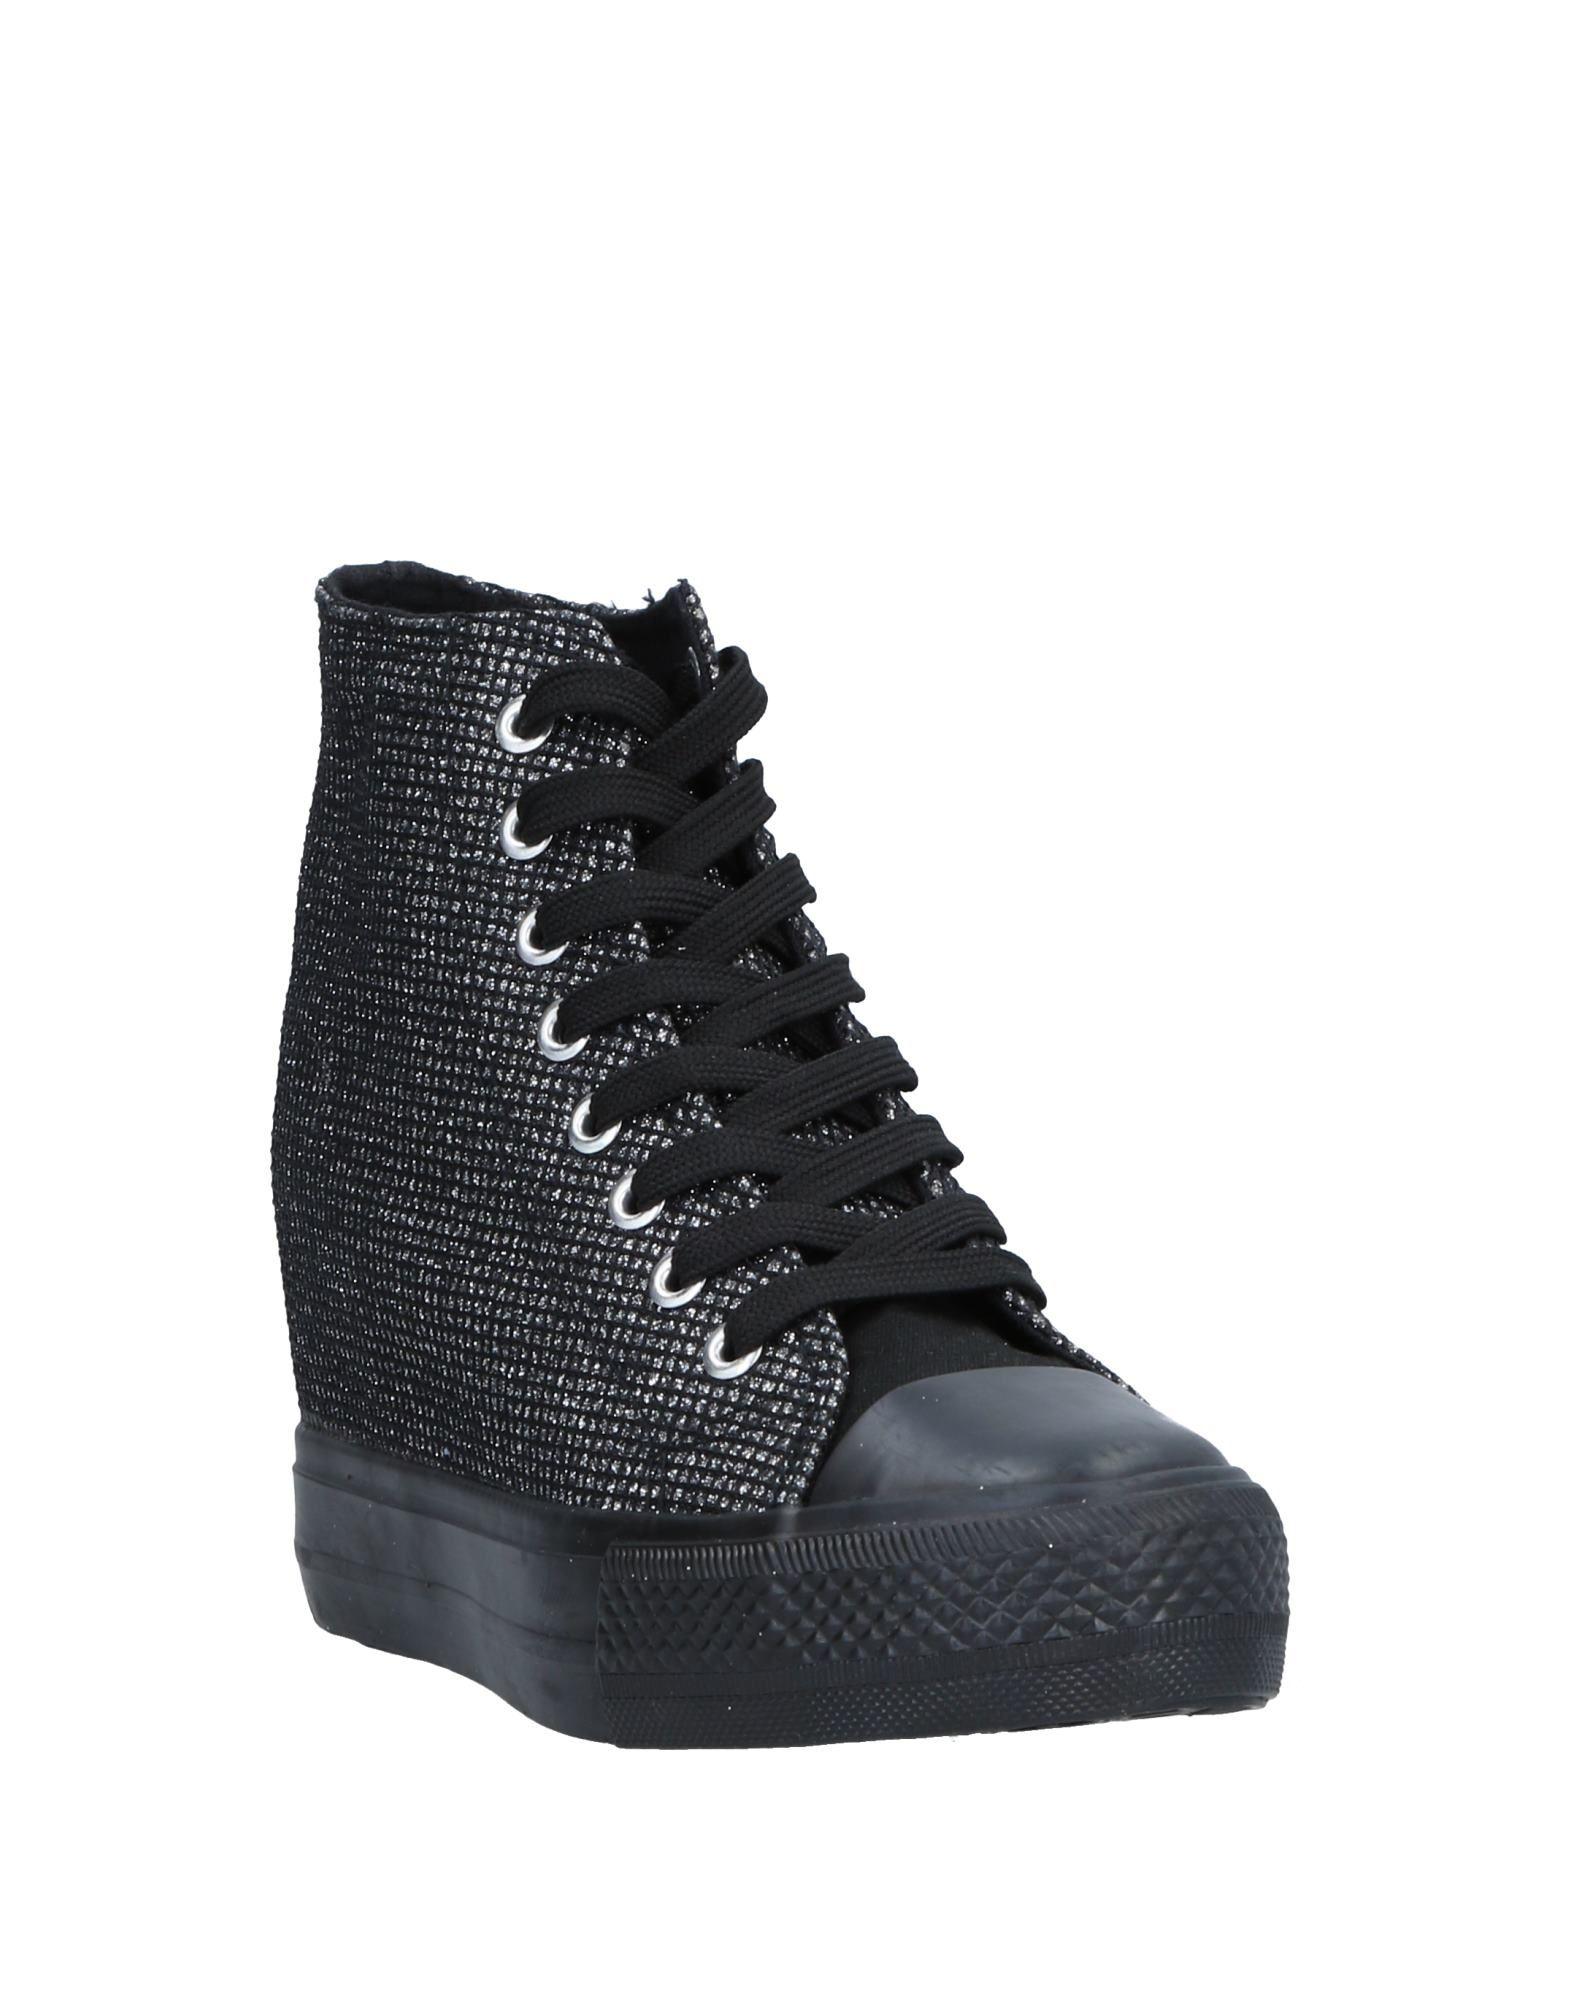 Roberto Della 11529004KP Croce Sneakers Damen  11529004KP Della Gute Qualität beliebte Schuhe 6fb105